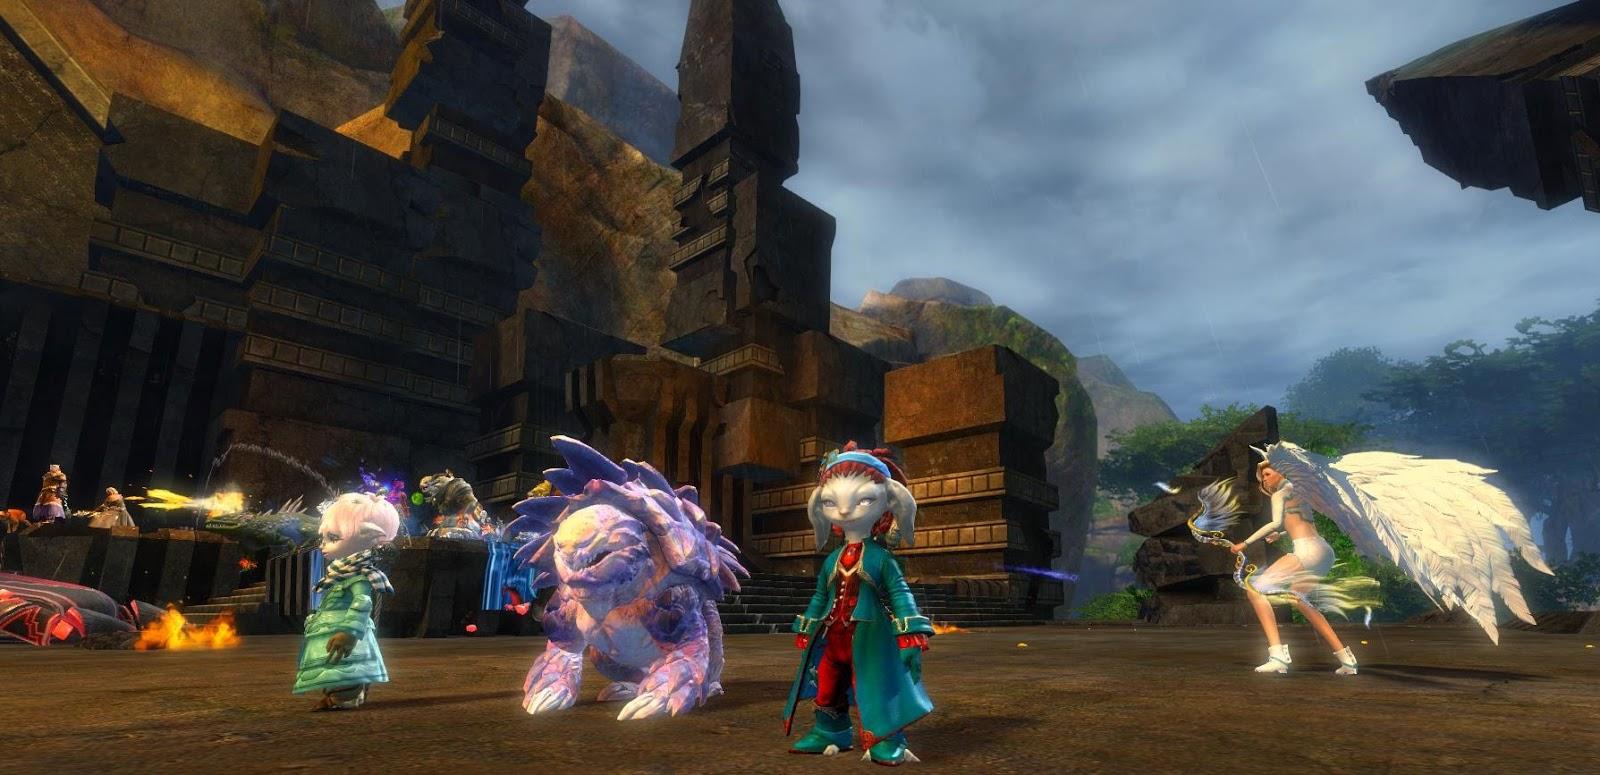 Guild wars 2 gw2 darkened desires gw2 fashion - Pink Pet Parade Gw2